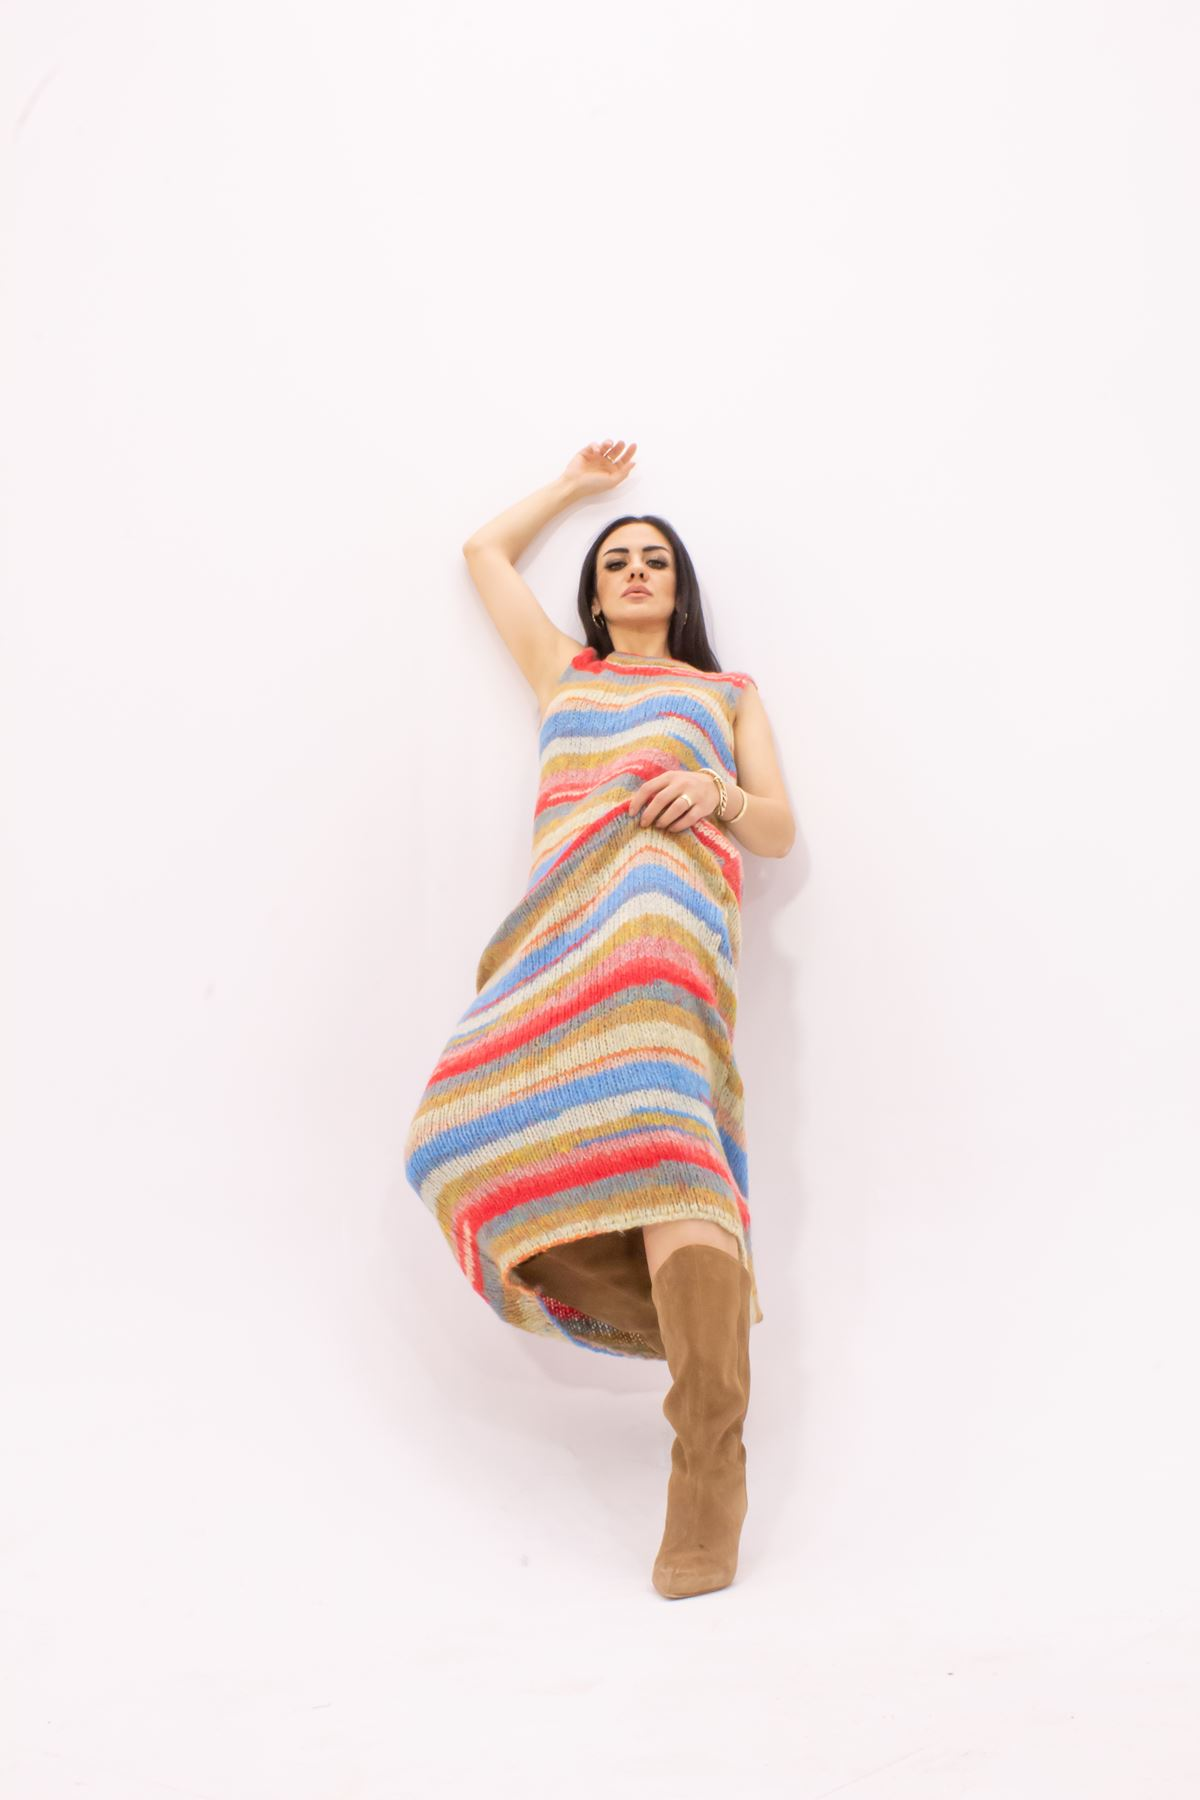 Orjinal Marka Mango Örme Elbise